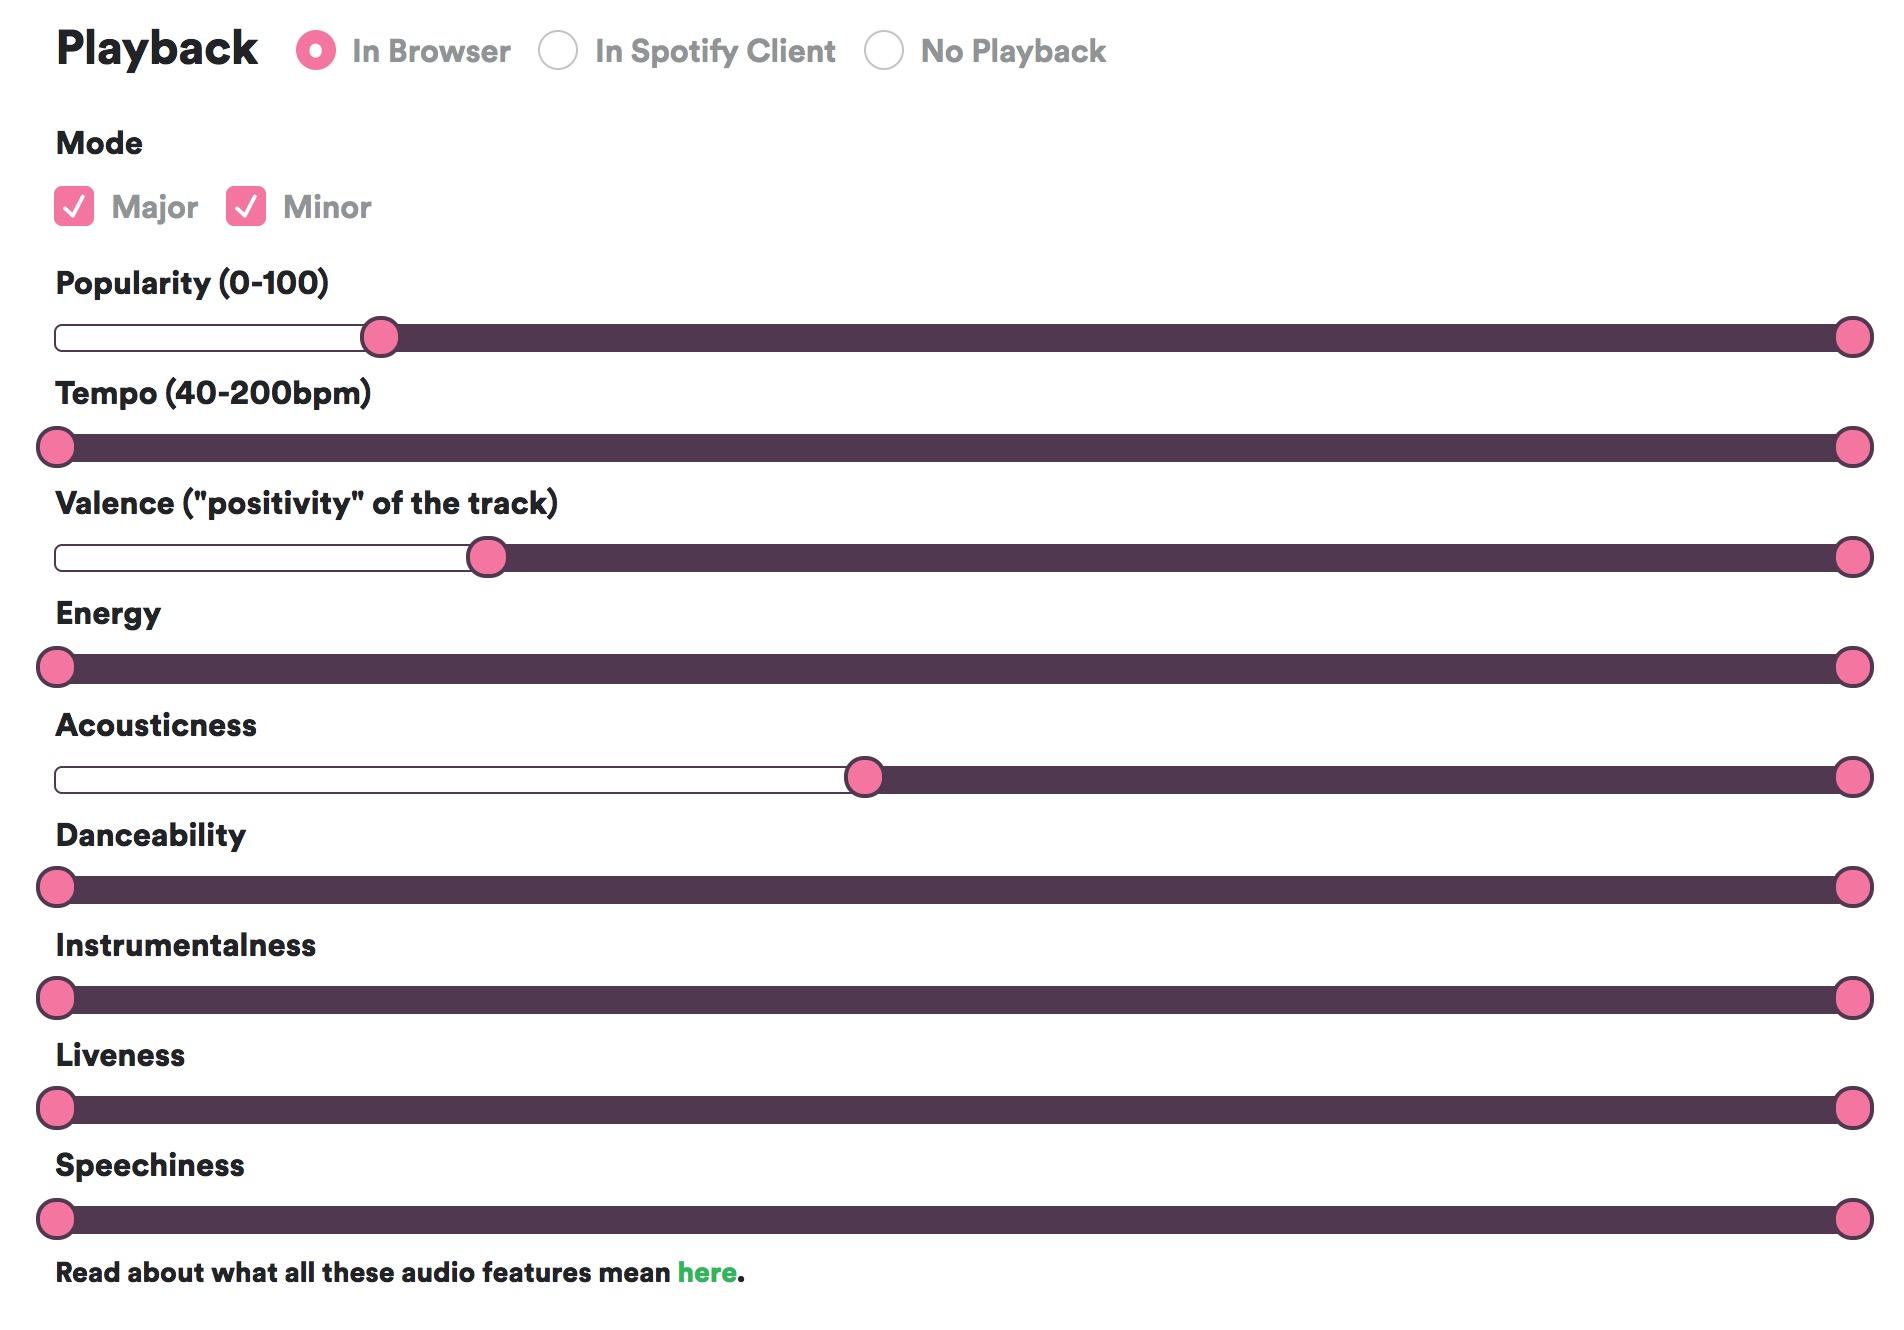 Tweak Spotify's recommendation tech to create custom playlists